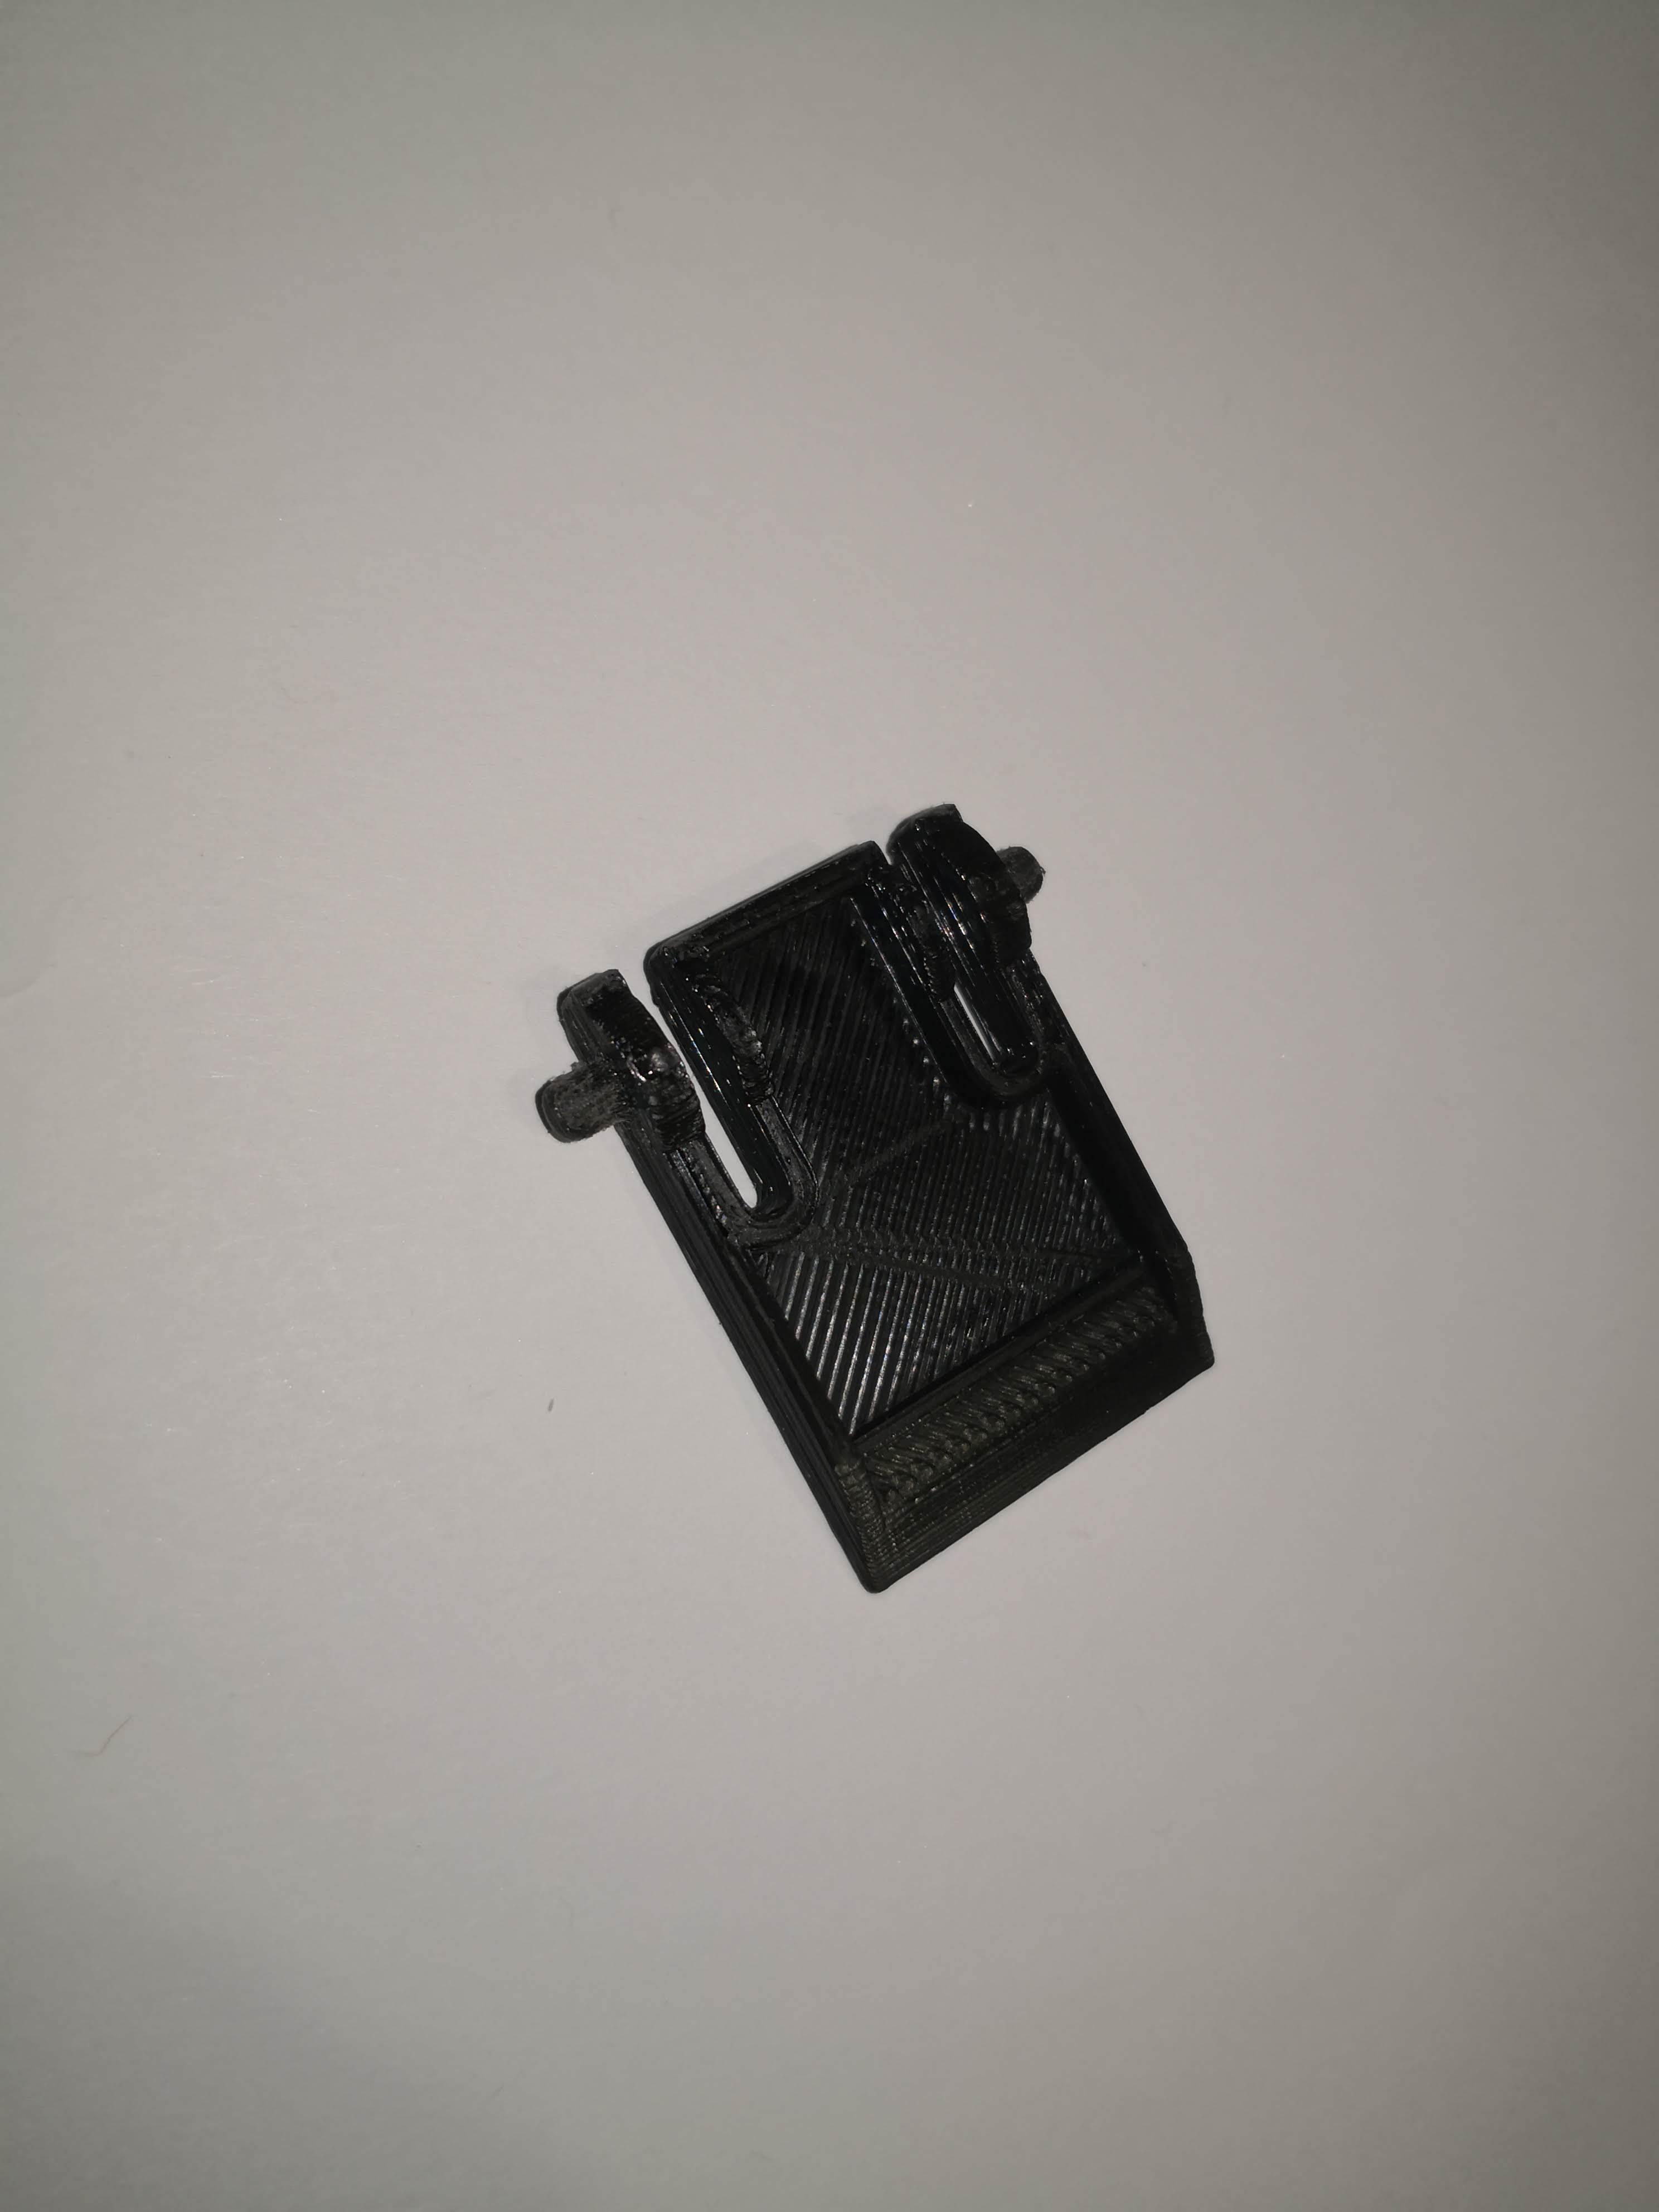 IMG_20200323_190347.jpg Download free STL file Keyboard stand Roccat Isku • 3D printing design, Icedragon